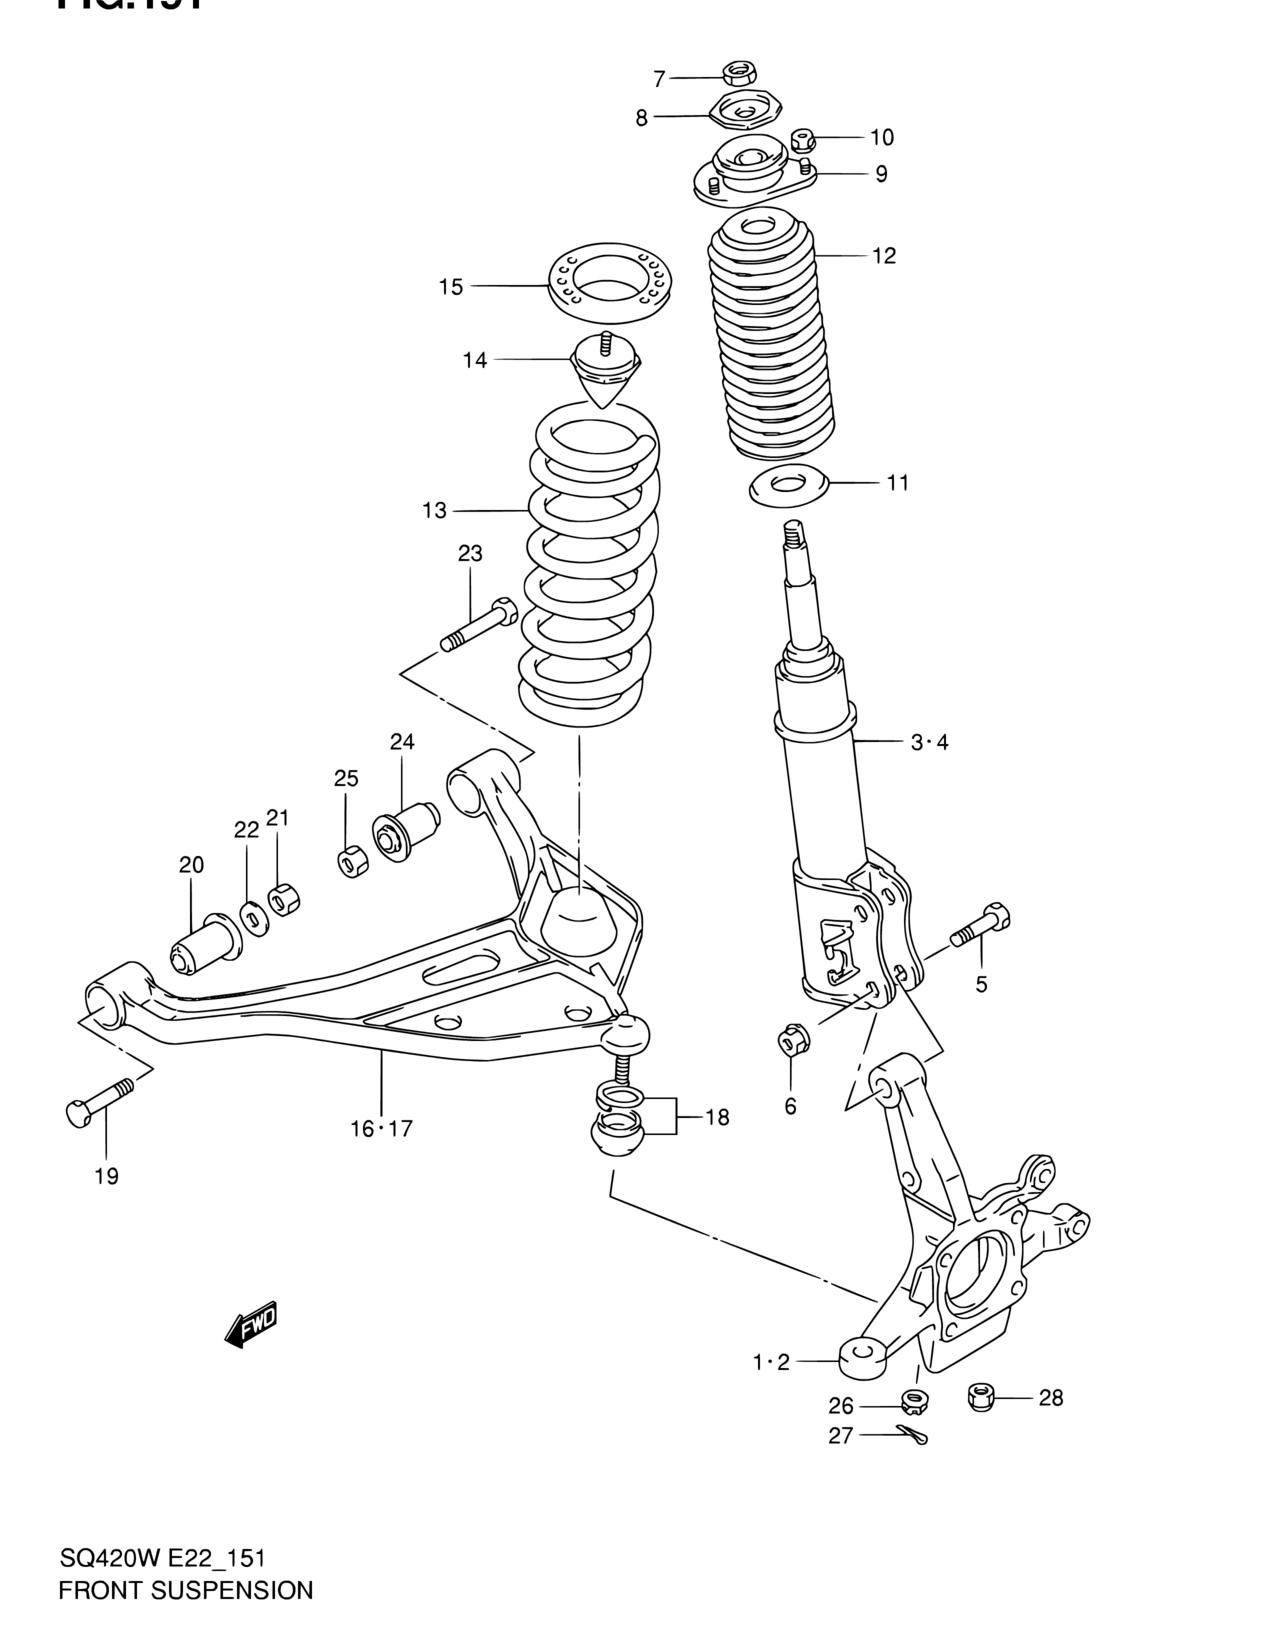 Lexus Lx470 Suspension Diagram Electrical Wiring Diagrams 1999 Parts Schematic Suzuki Vitara Front Block